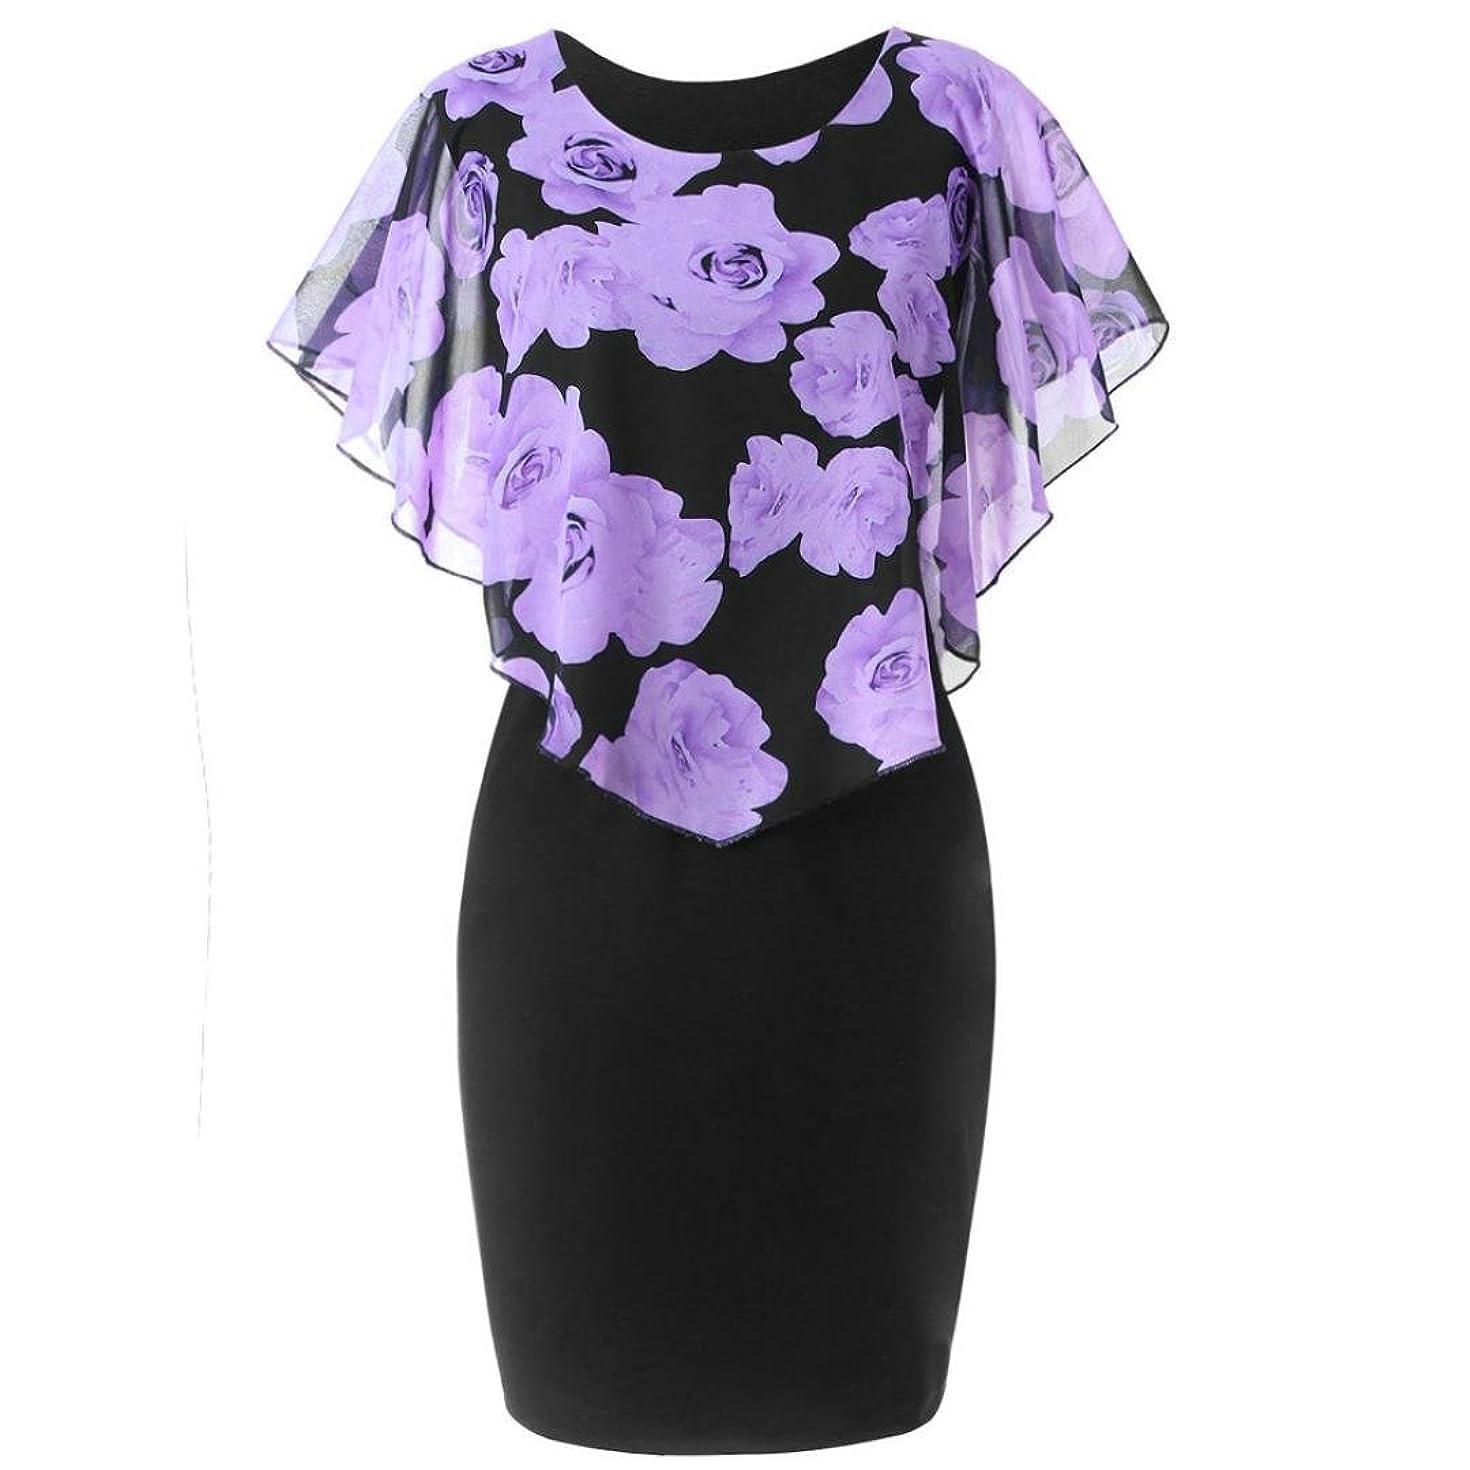 Howstar Women's Ruffles Mini Dress Casual Plus Size Chiffon Dresses for Ladies Party Bodycon Short Dress